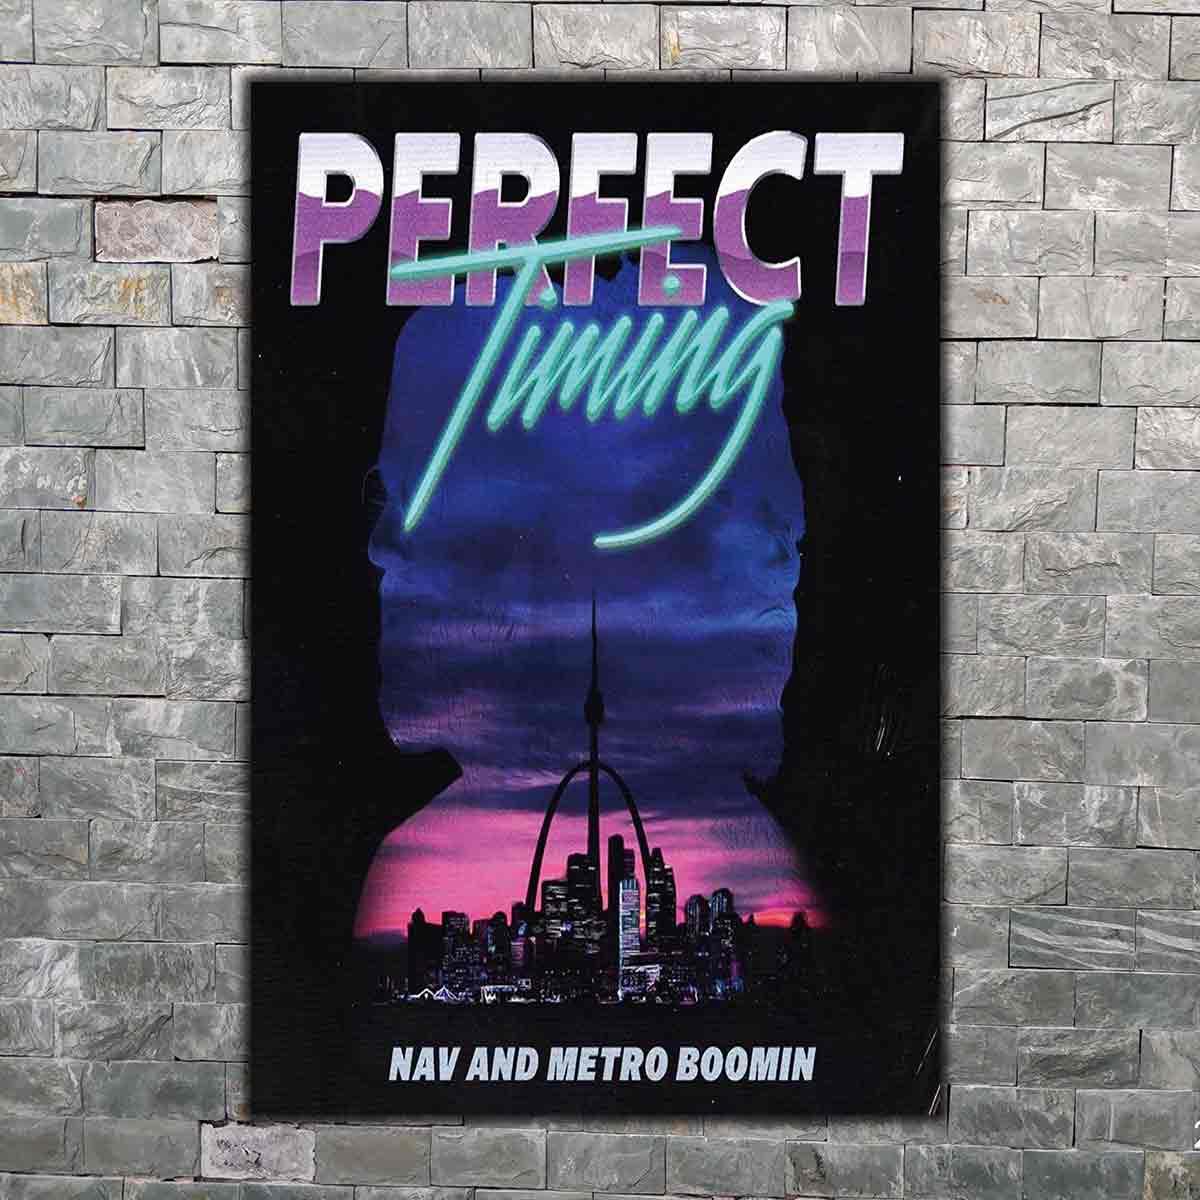 Muse Uprising Hot Music Rapper New Album Cover 24x24 27x27 Fabric Poster E-109